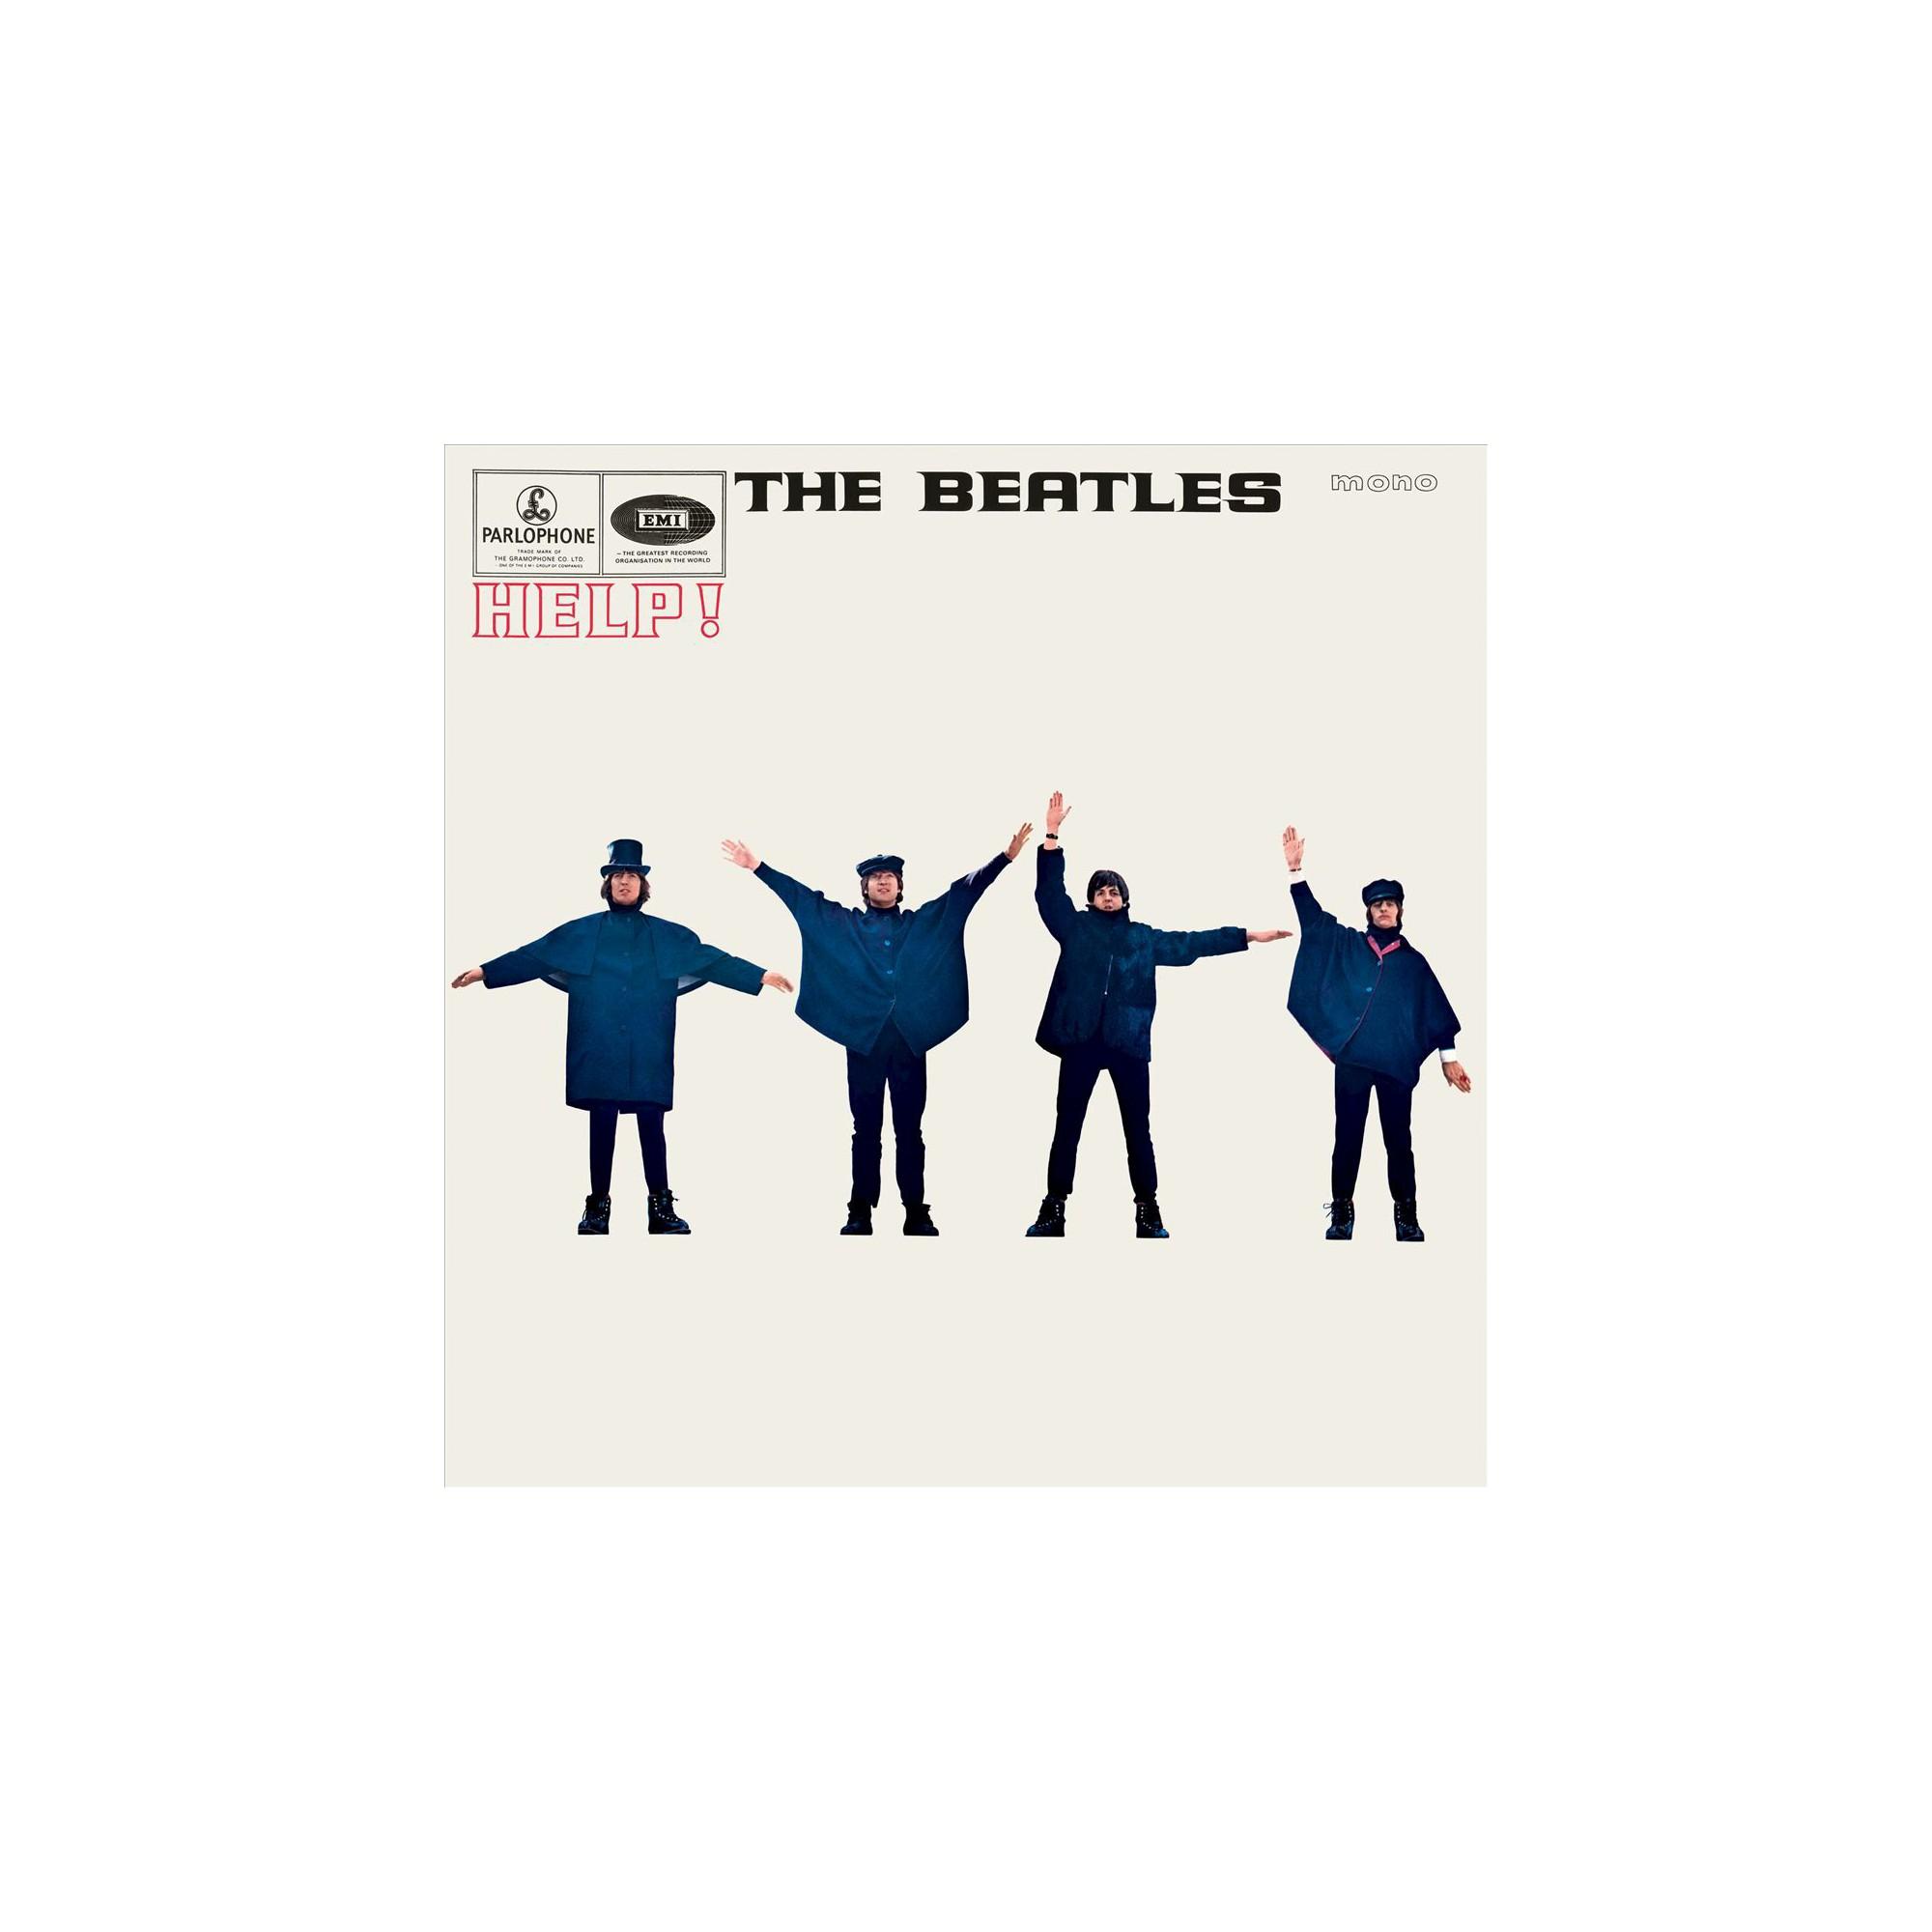 The Beatles - Help! (Mono Vinyl) | Products | The beatles